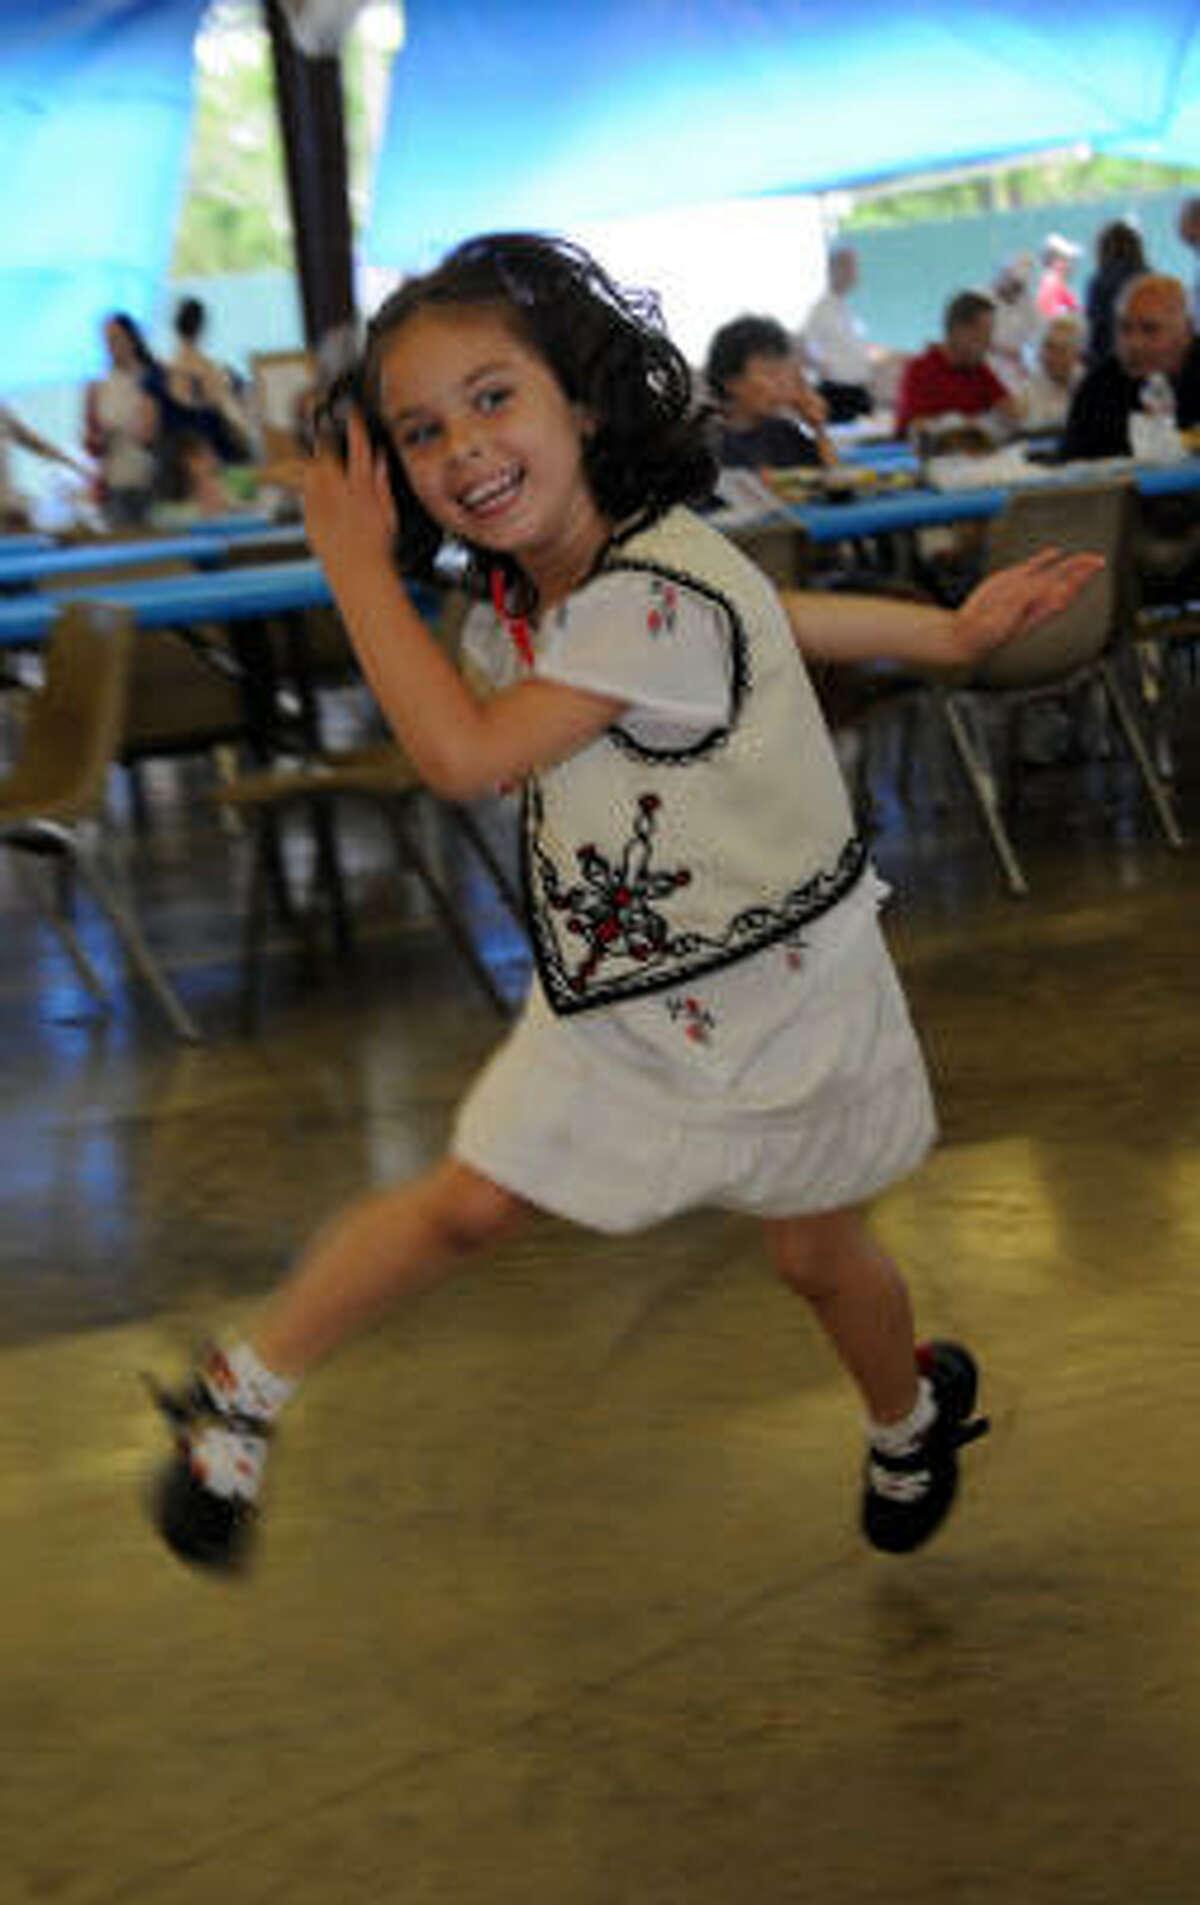 Nicoleta Savage, 4 dances to the music.